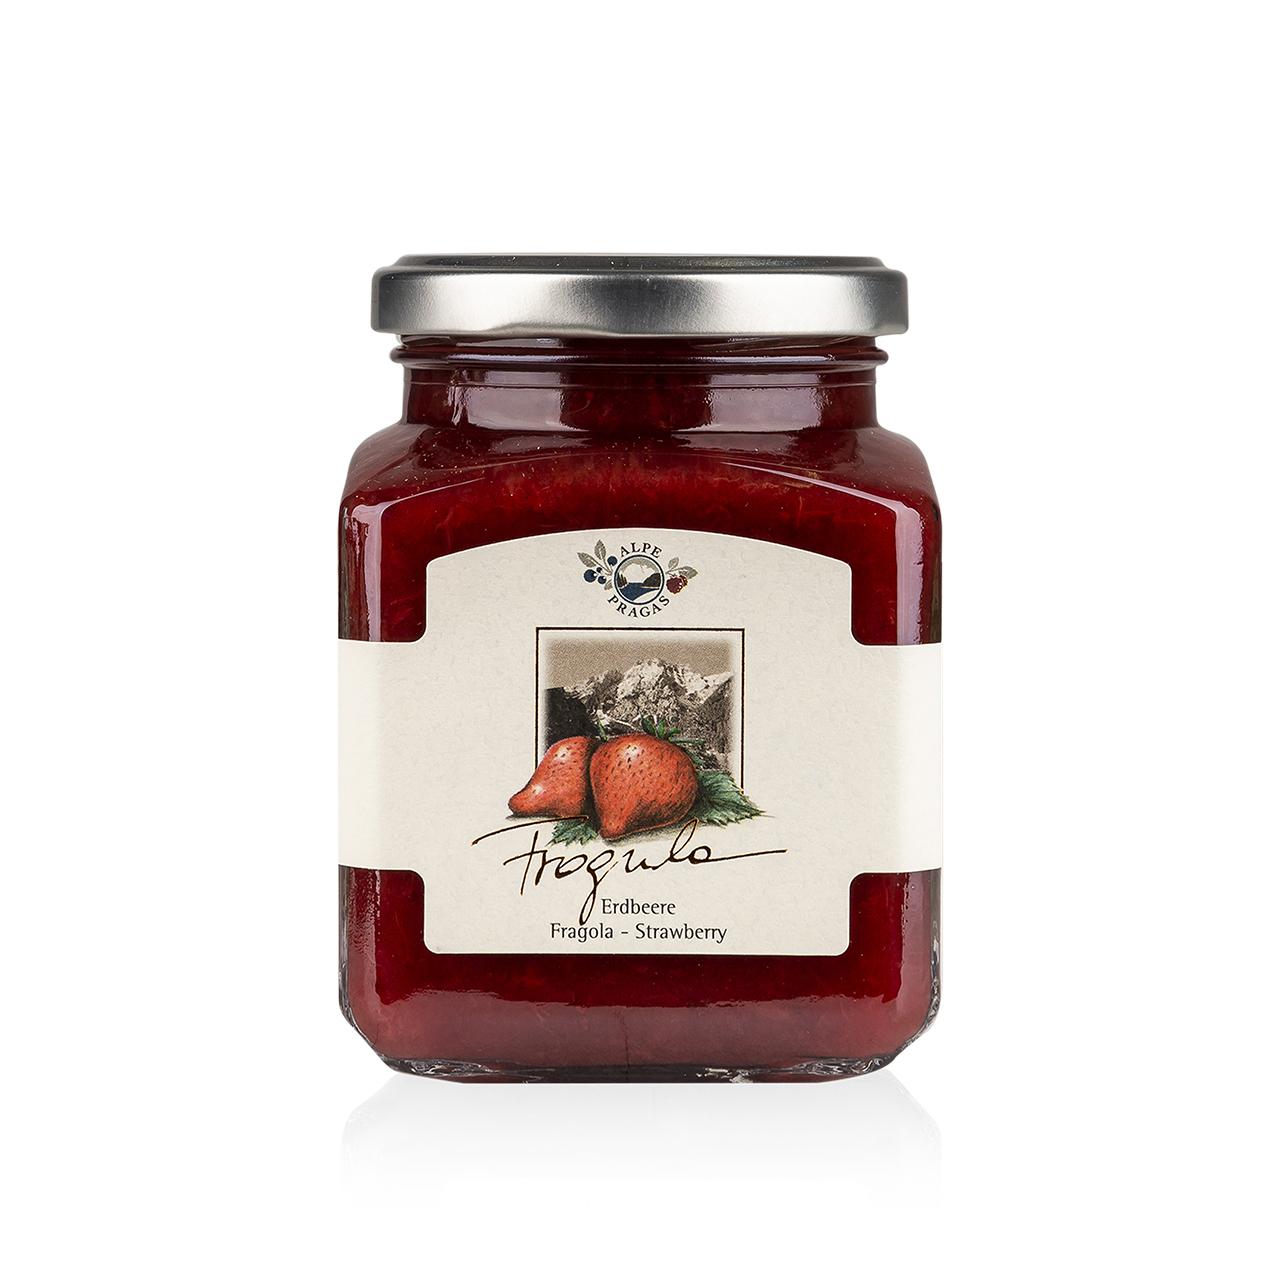 Fragula Erdbeere Konfitüre - 335g